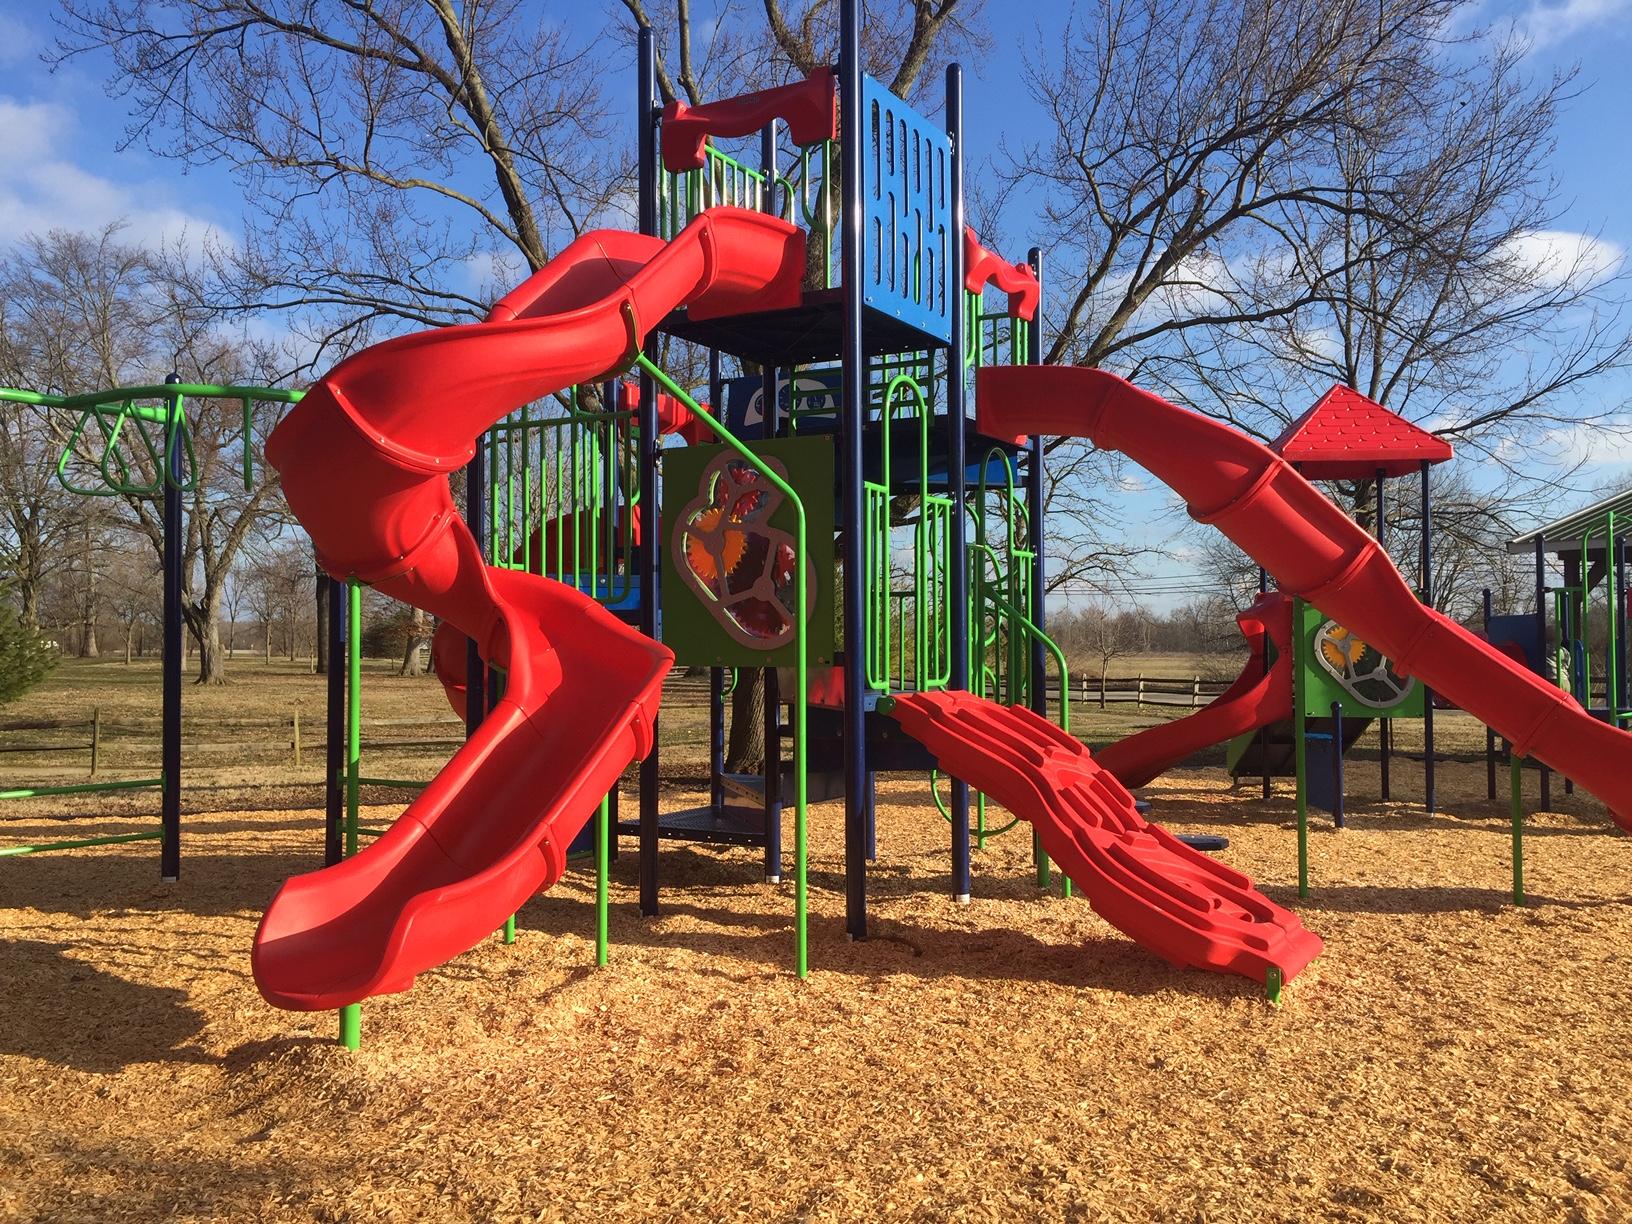 Playground slides large